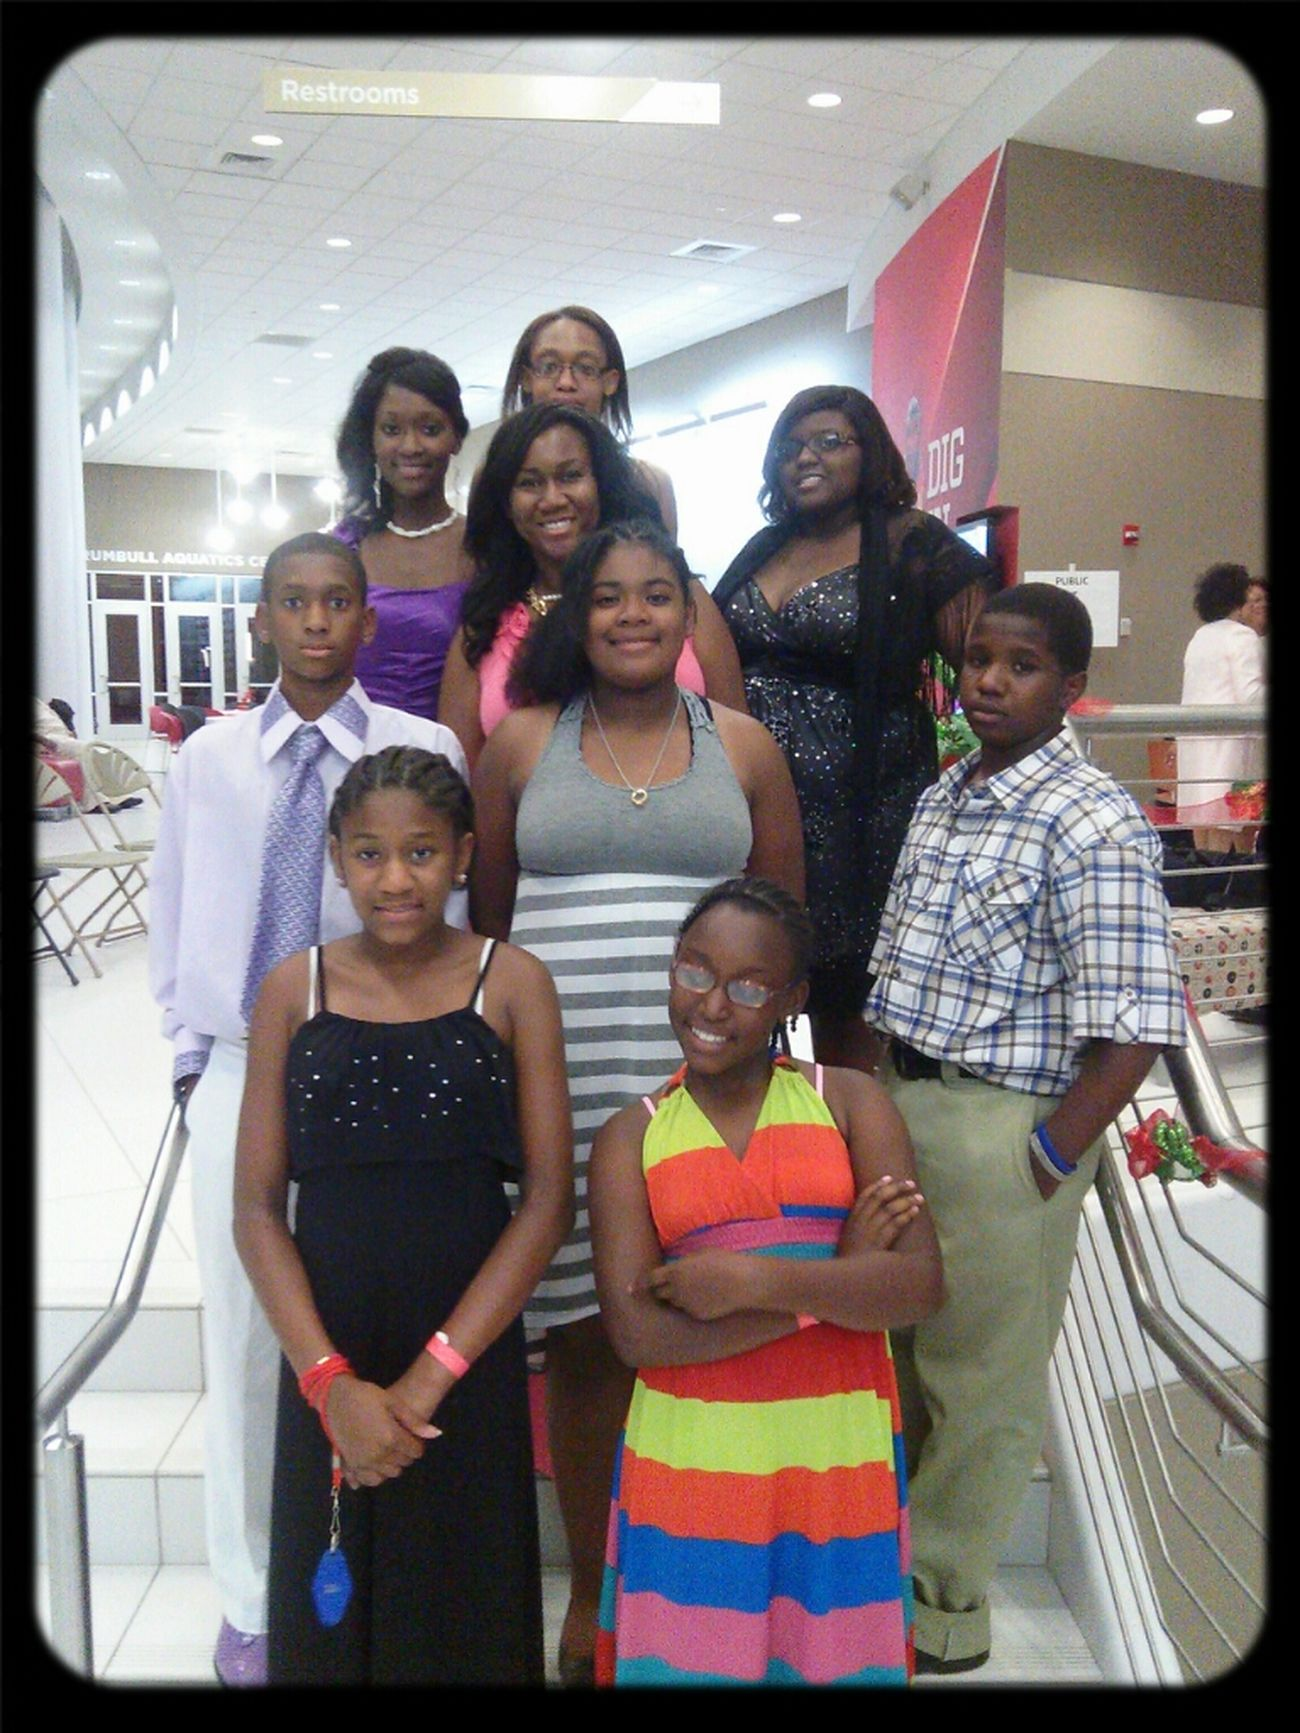 At My Church Retreat 2013